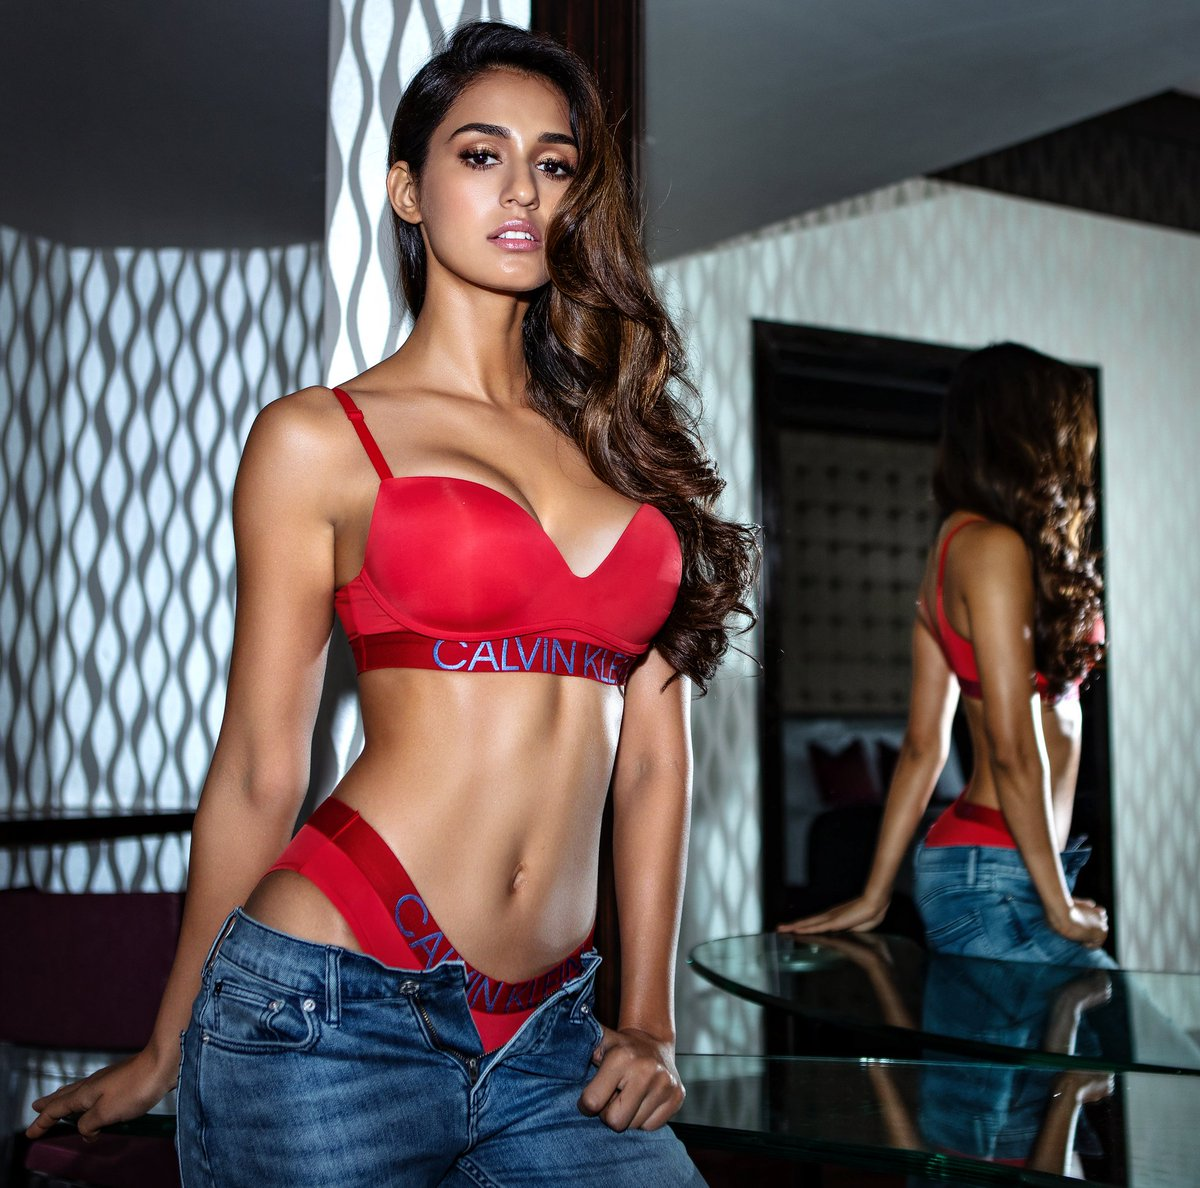 Disha Patani, Tiger Shroff, Disha Patani in lingerie, Bollywood actress, Bollywood news, Bollywood gossips, Entertainment news